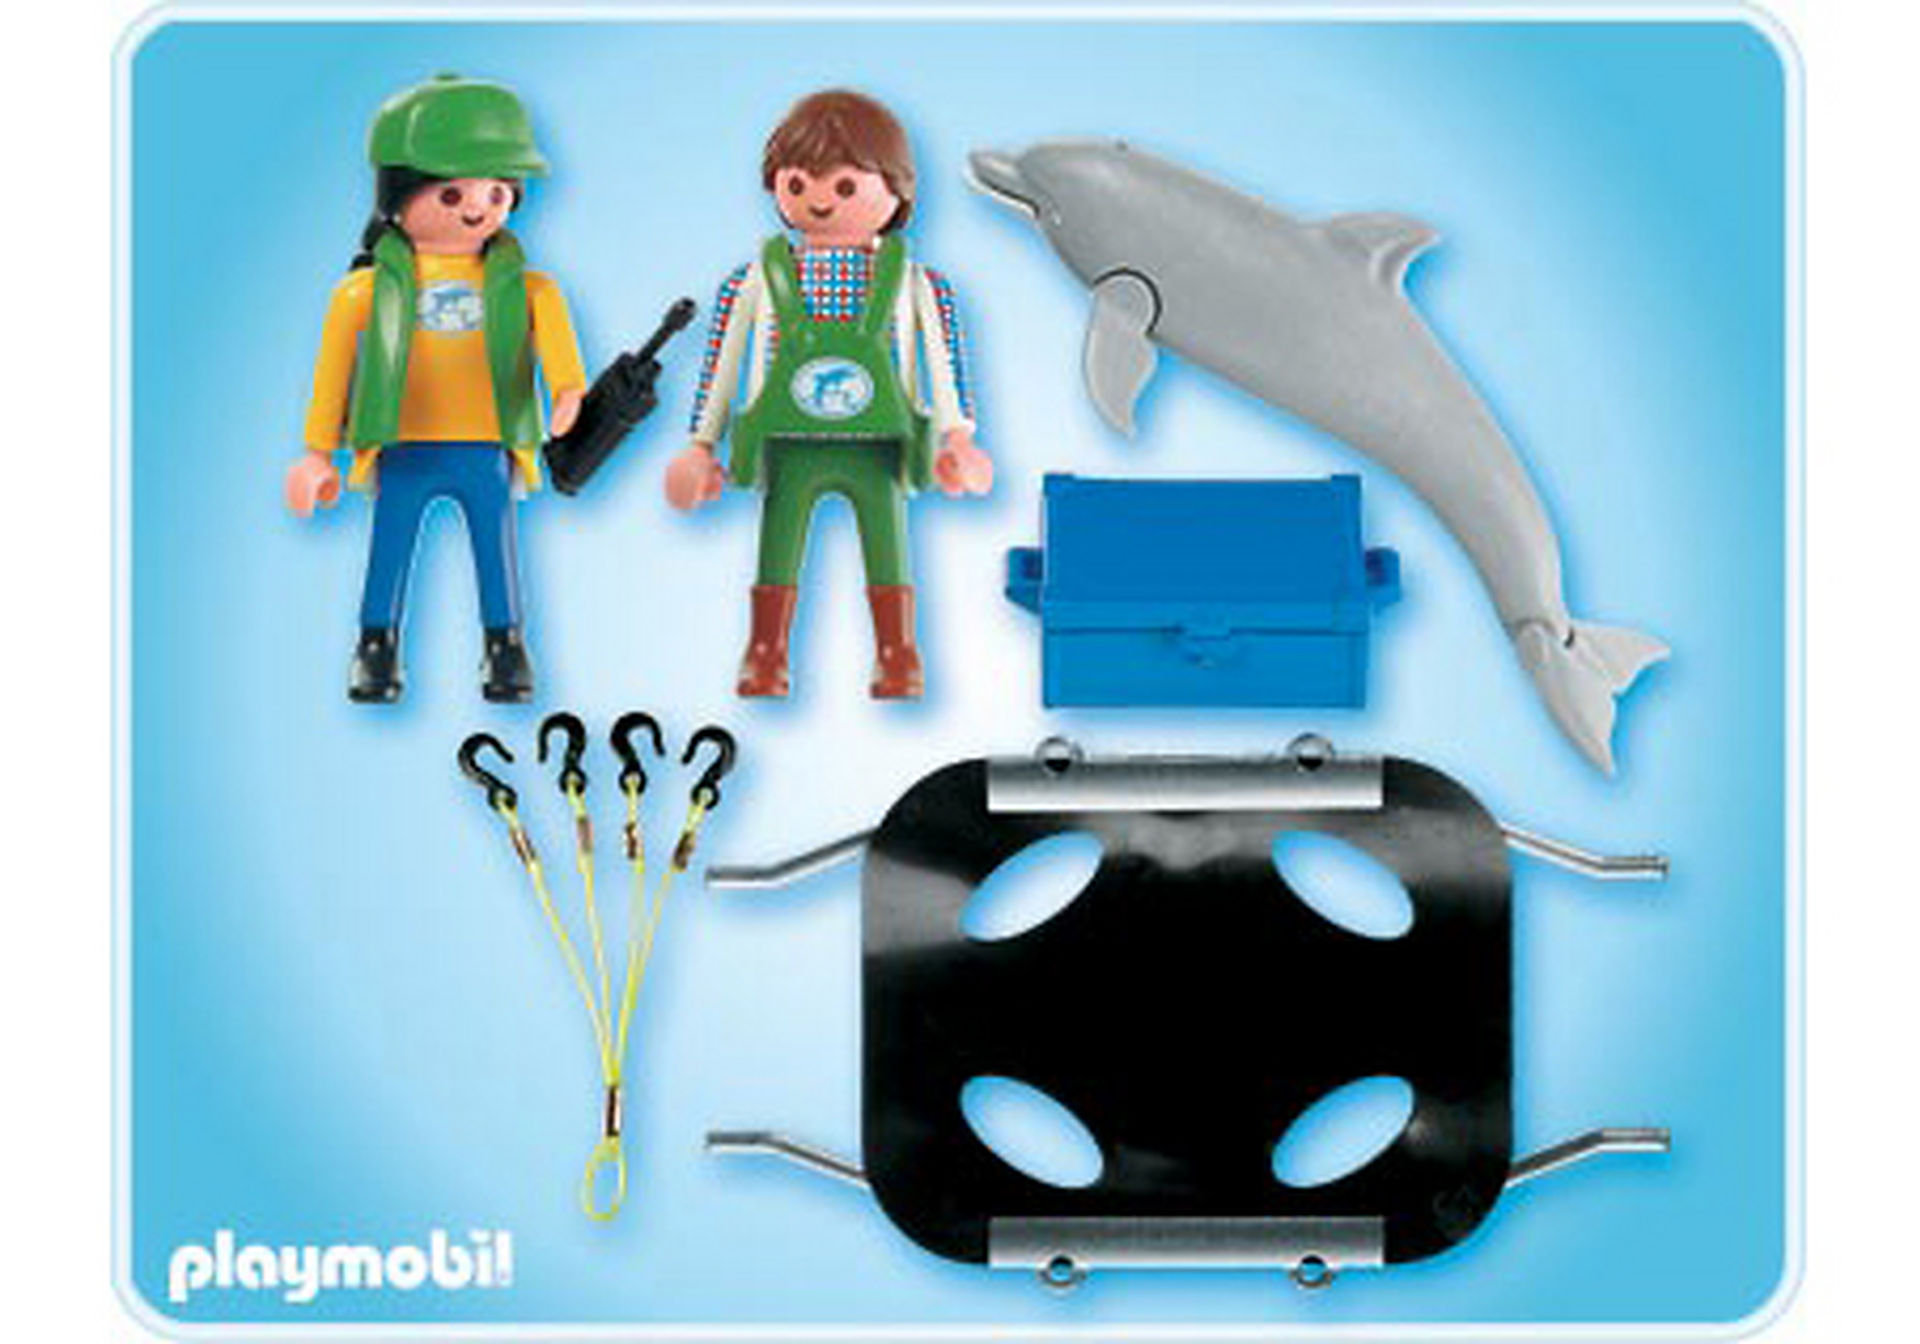 4466-A Tierpfleger mit Delfin zoom image2